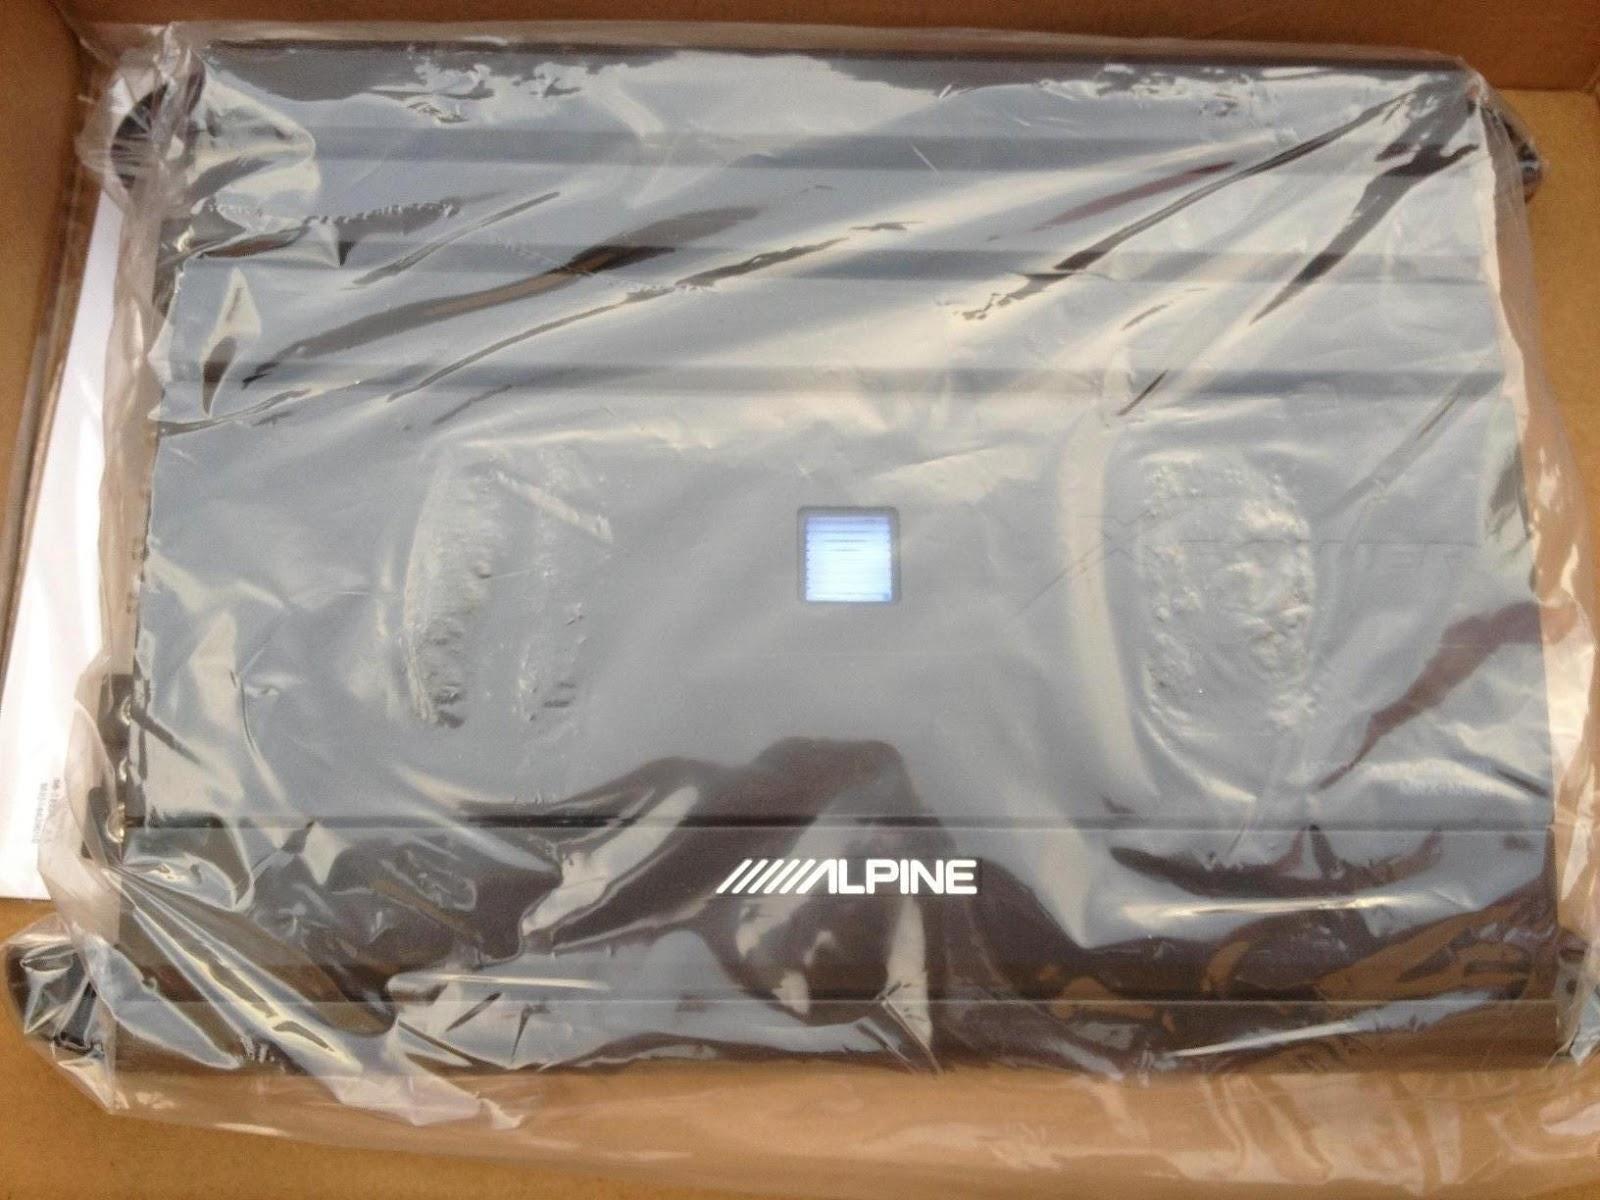 Demac Audio House: ALPINE MRX M100 1000W RMS MONOBLOCK CLASS